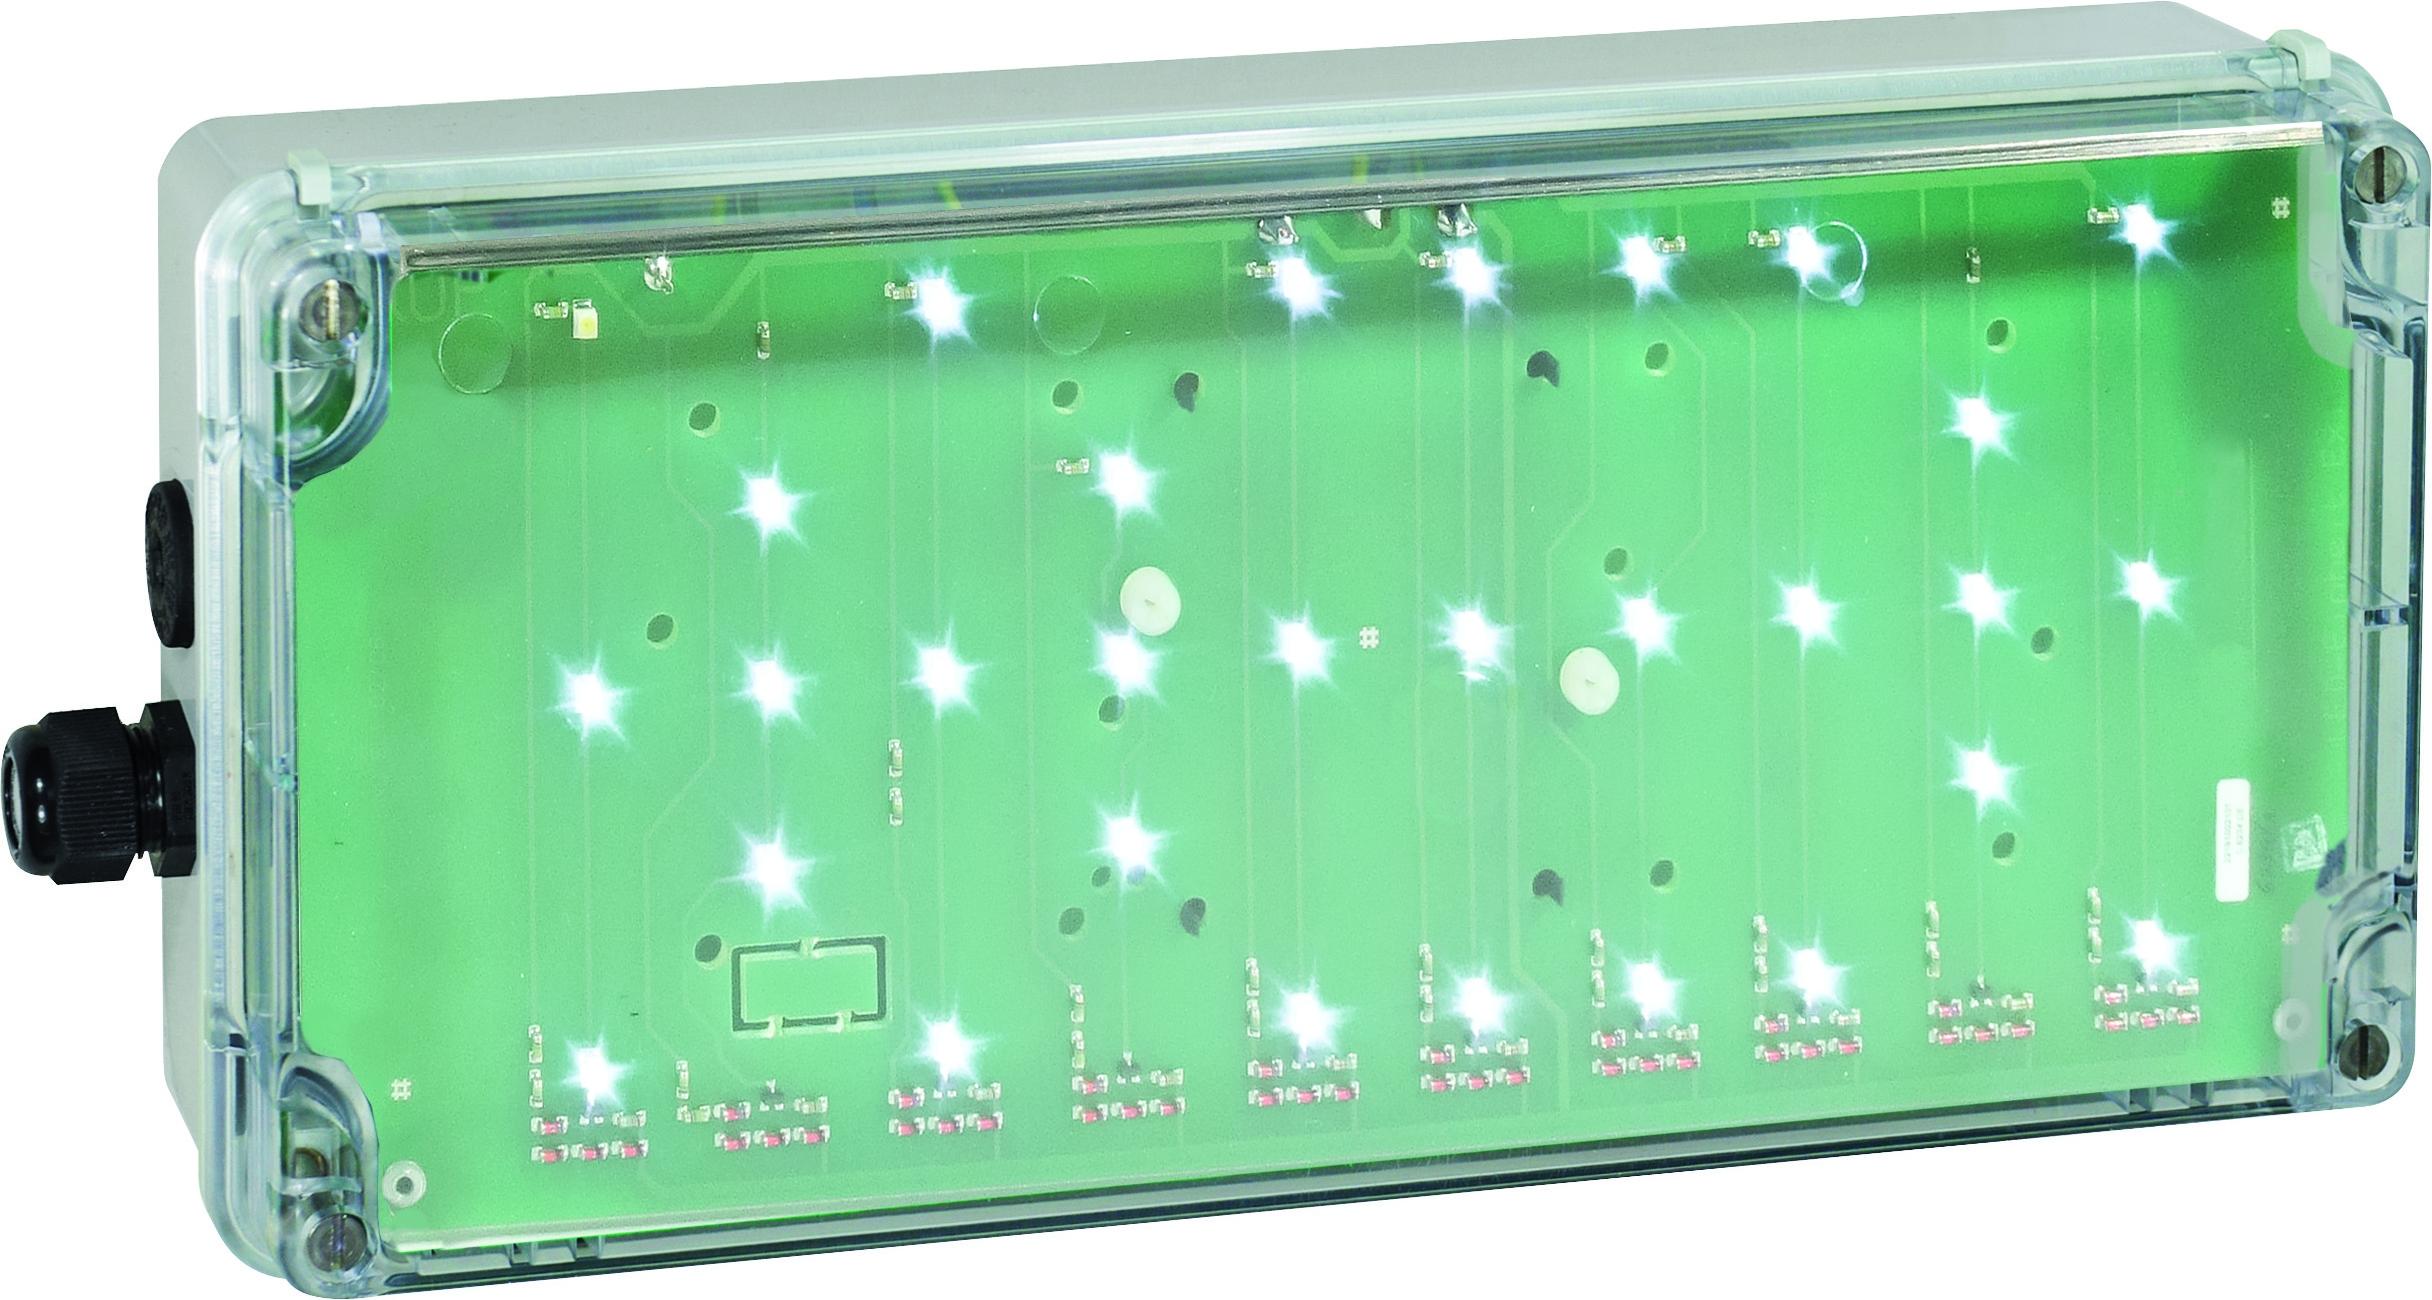 1 Stk Ex-Notleuchte EXIT Zone 2/22 LED/ 3h 230V AC, transparent NL93030004